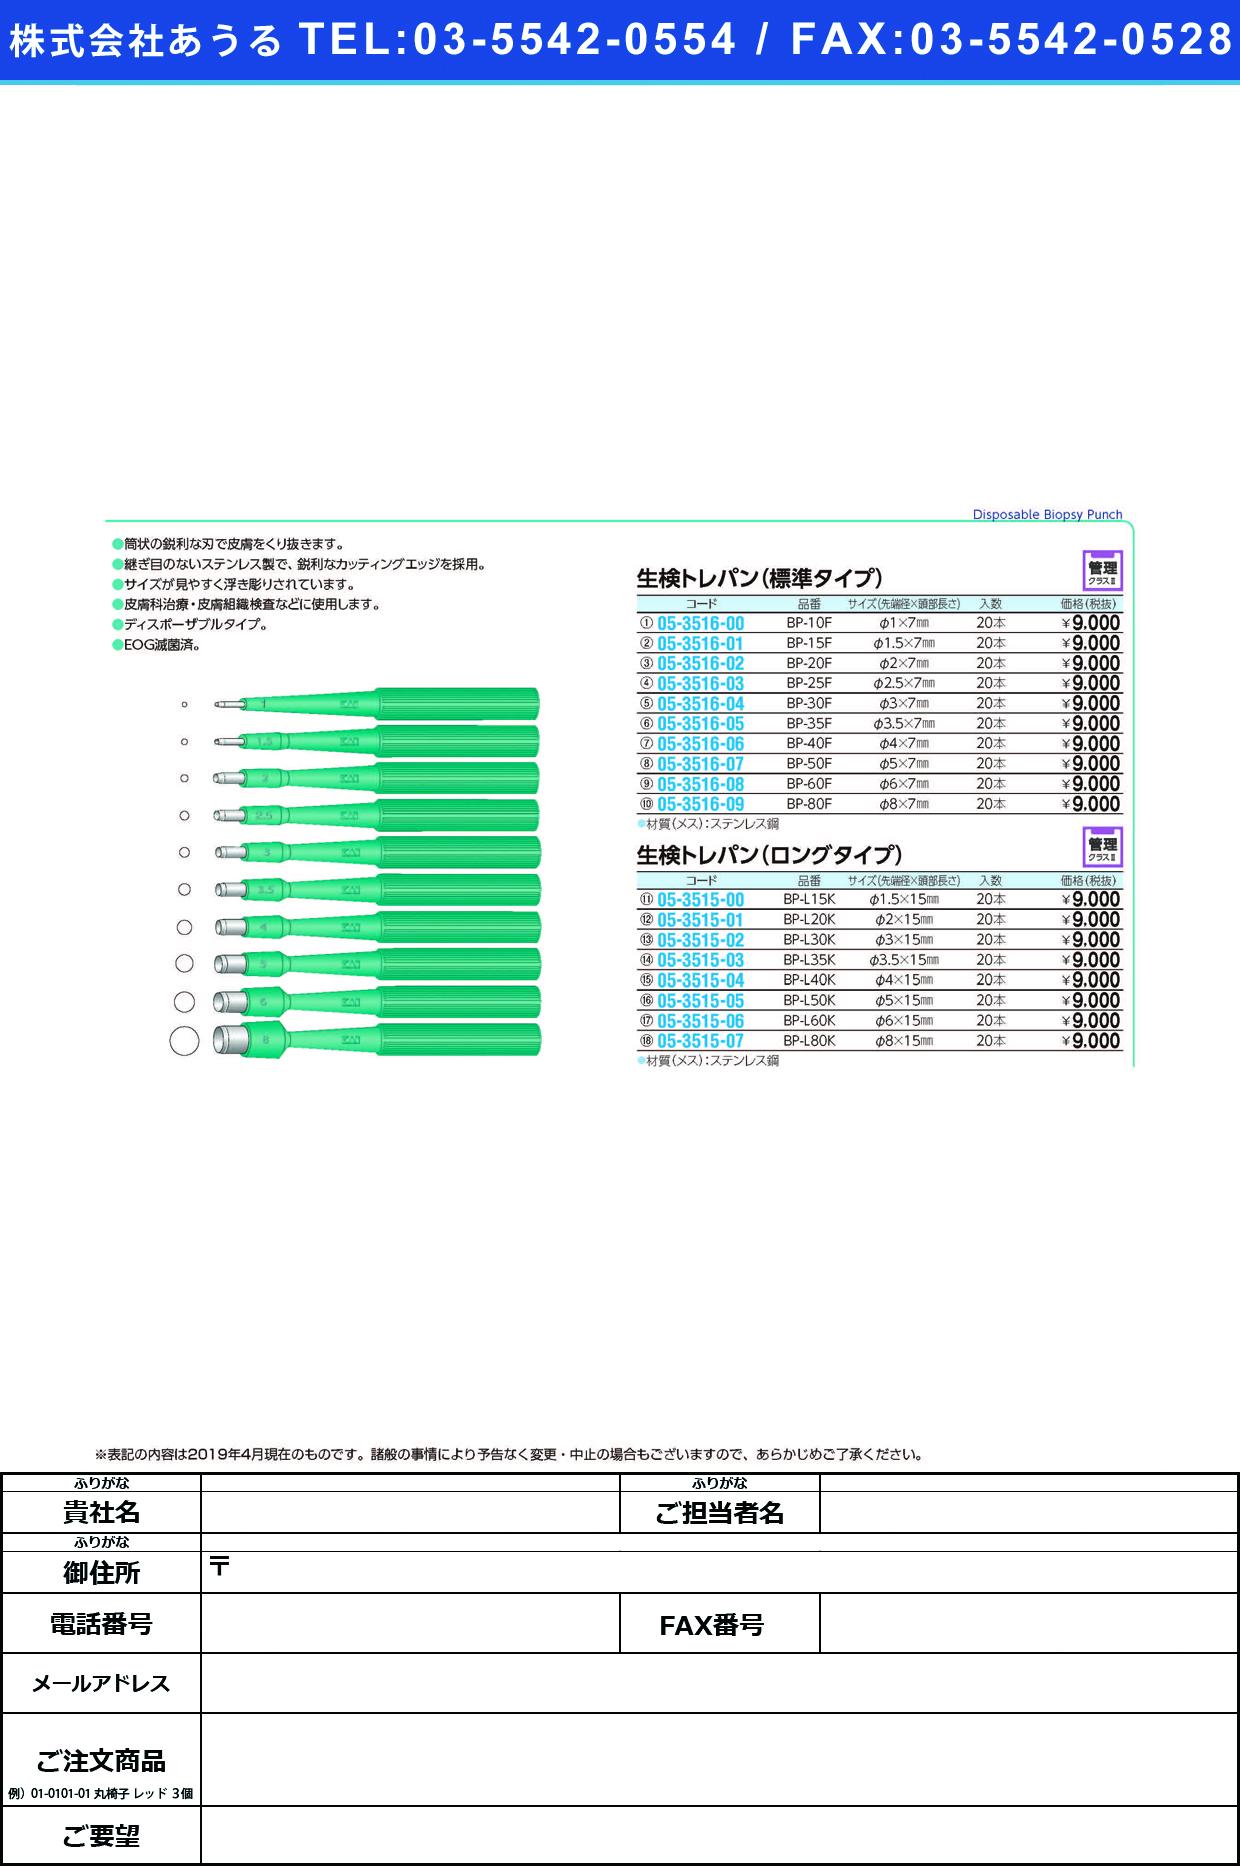 (05-3515-00)KAI生検トレパン(ロングタイプ) BP-L15K(1.5MM)20ホンイリ セイケントレパン(ロングタイプ)(カイインダストリーズ)【1箱単位】【2019年カタログ商品】